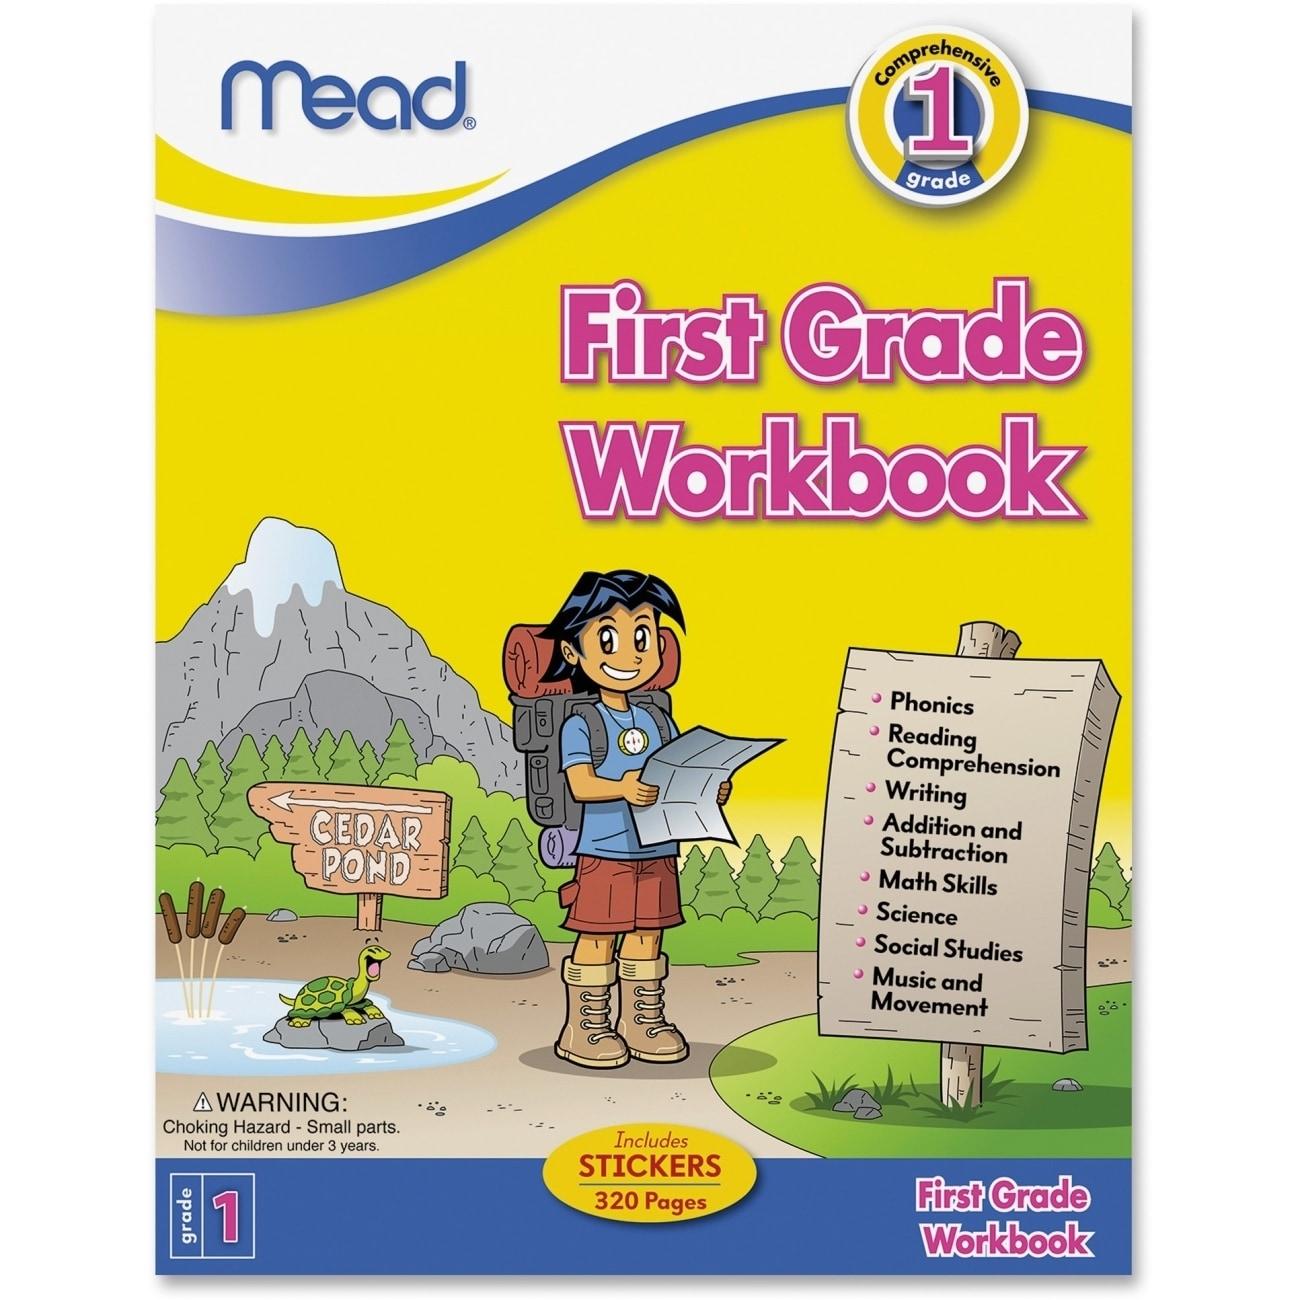 1st grade math workbook | Compare Prices at Nextag